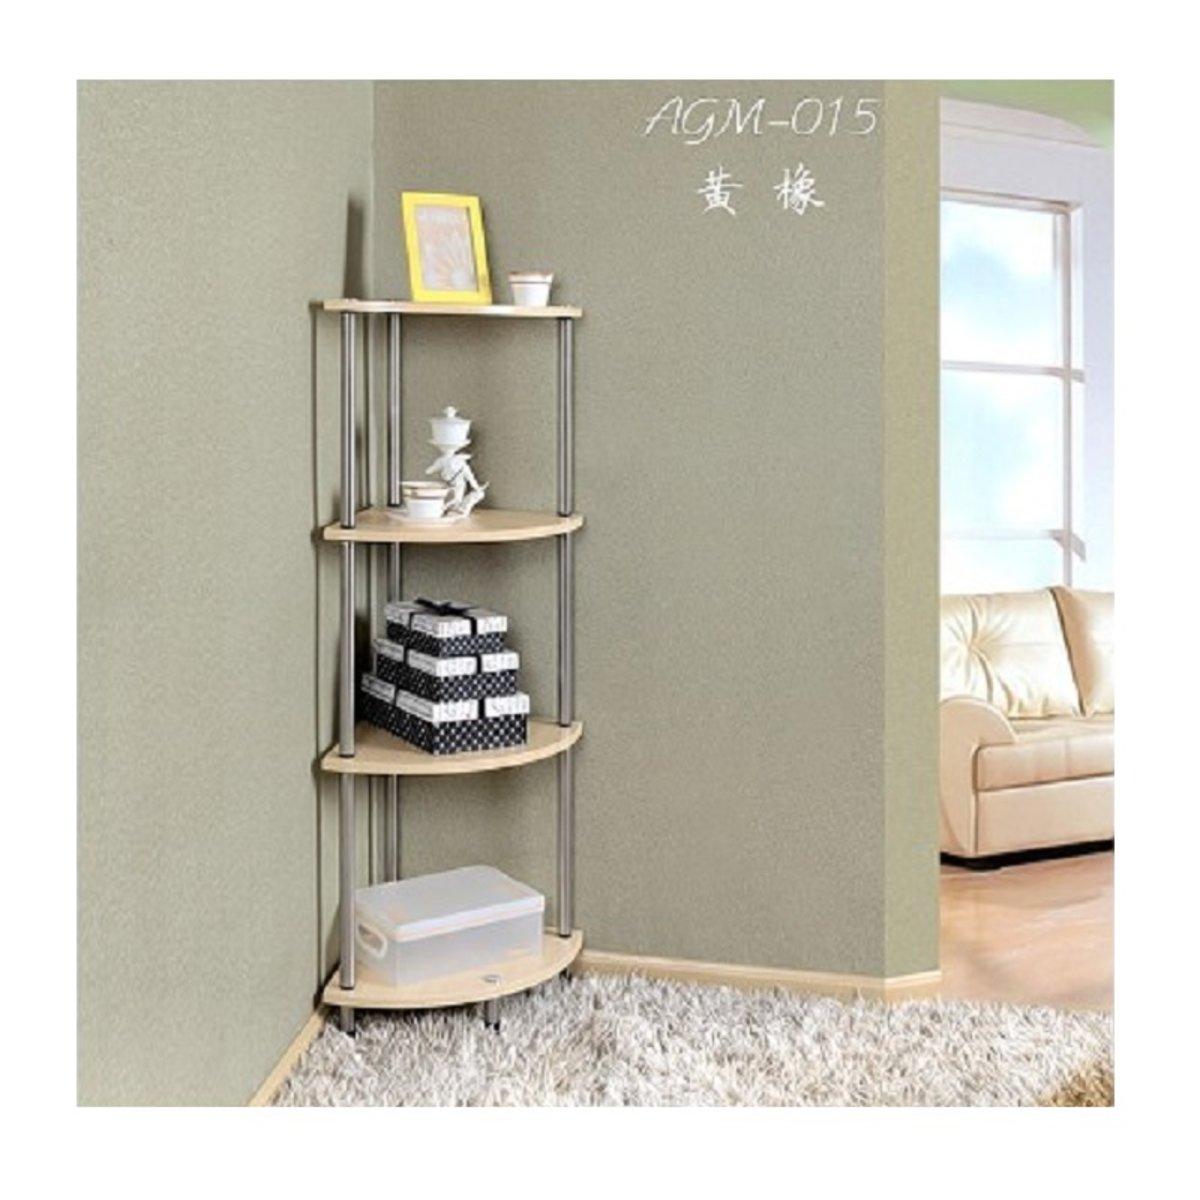 4 layers shelf - yellow green